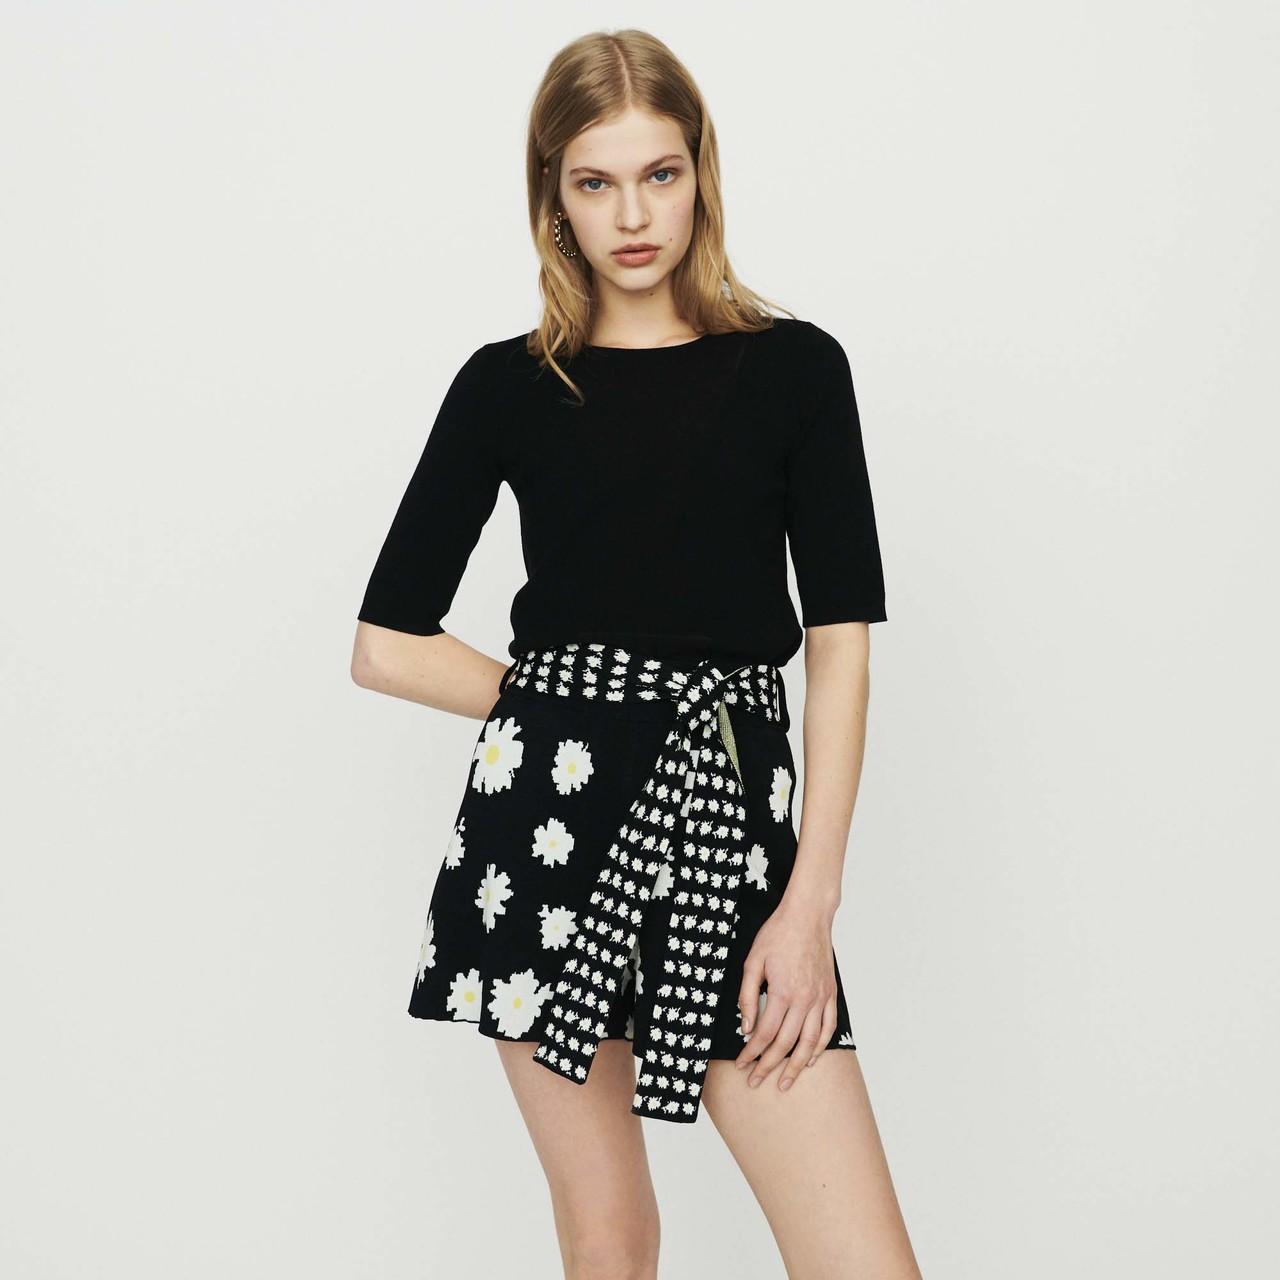 Short-Sleeved  Sweater - Black